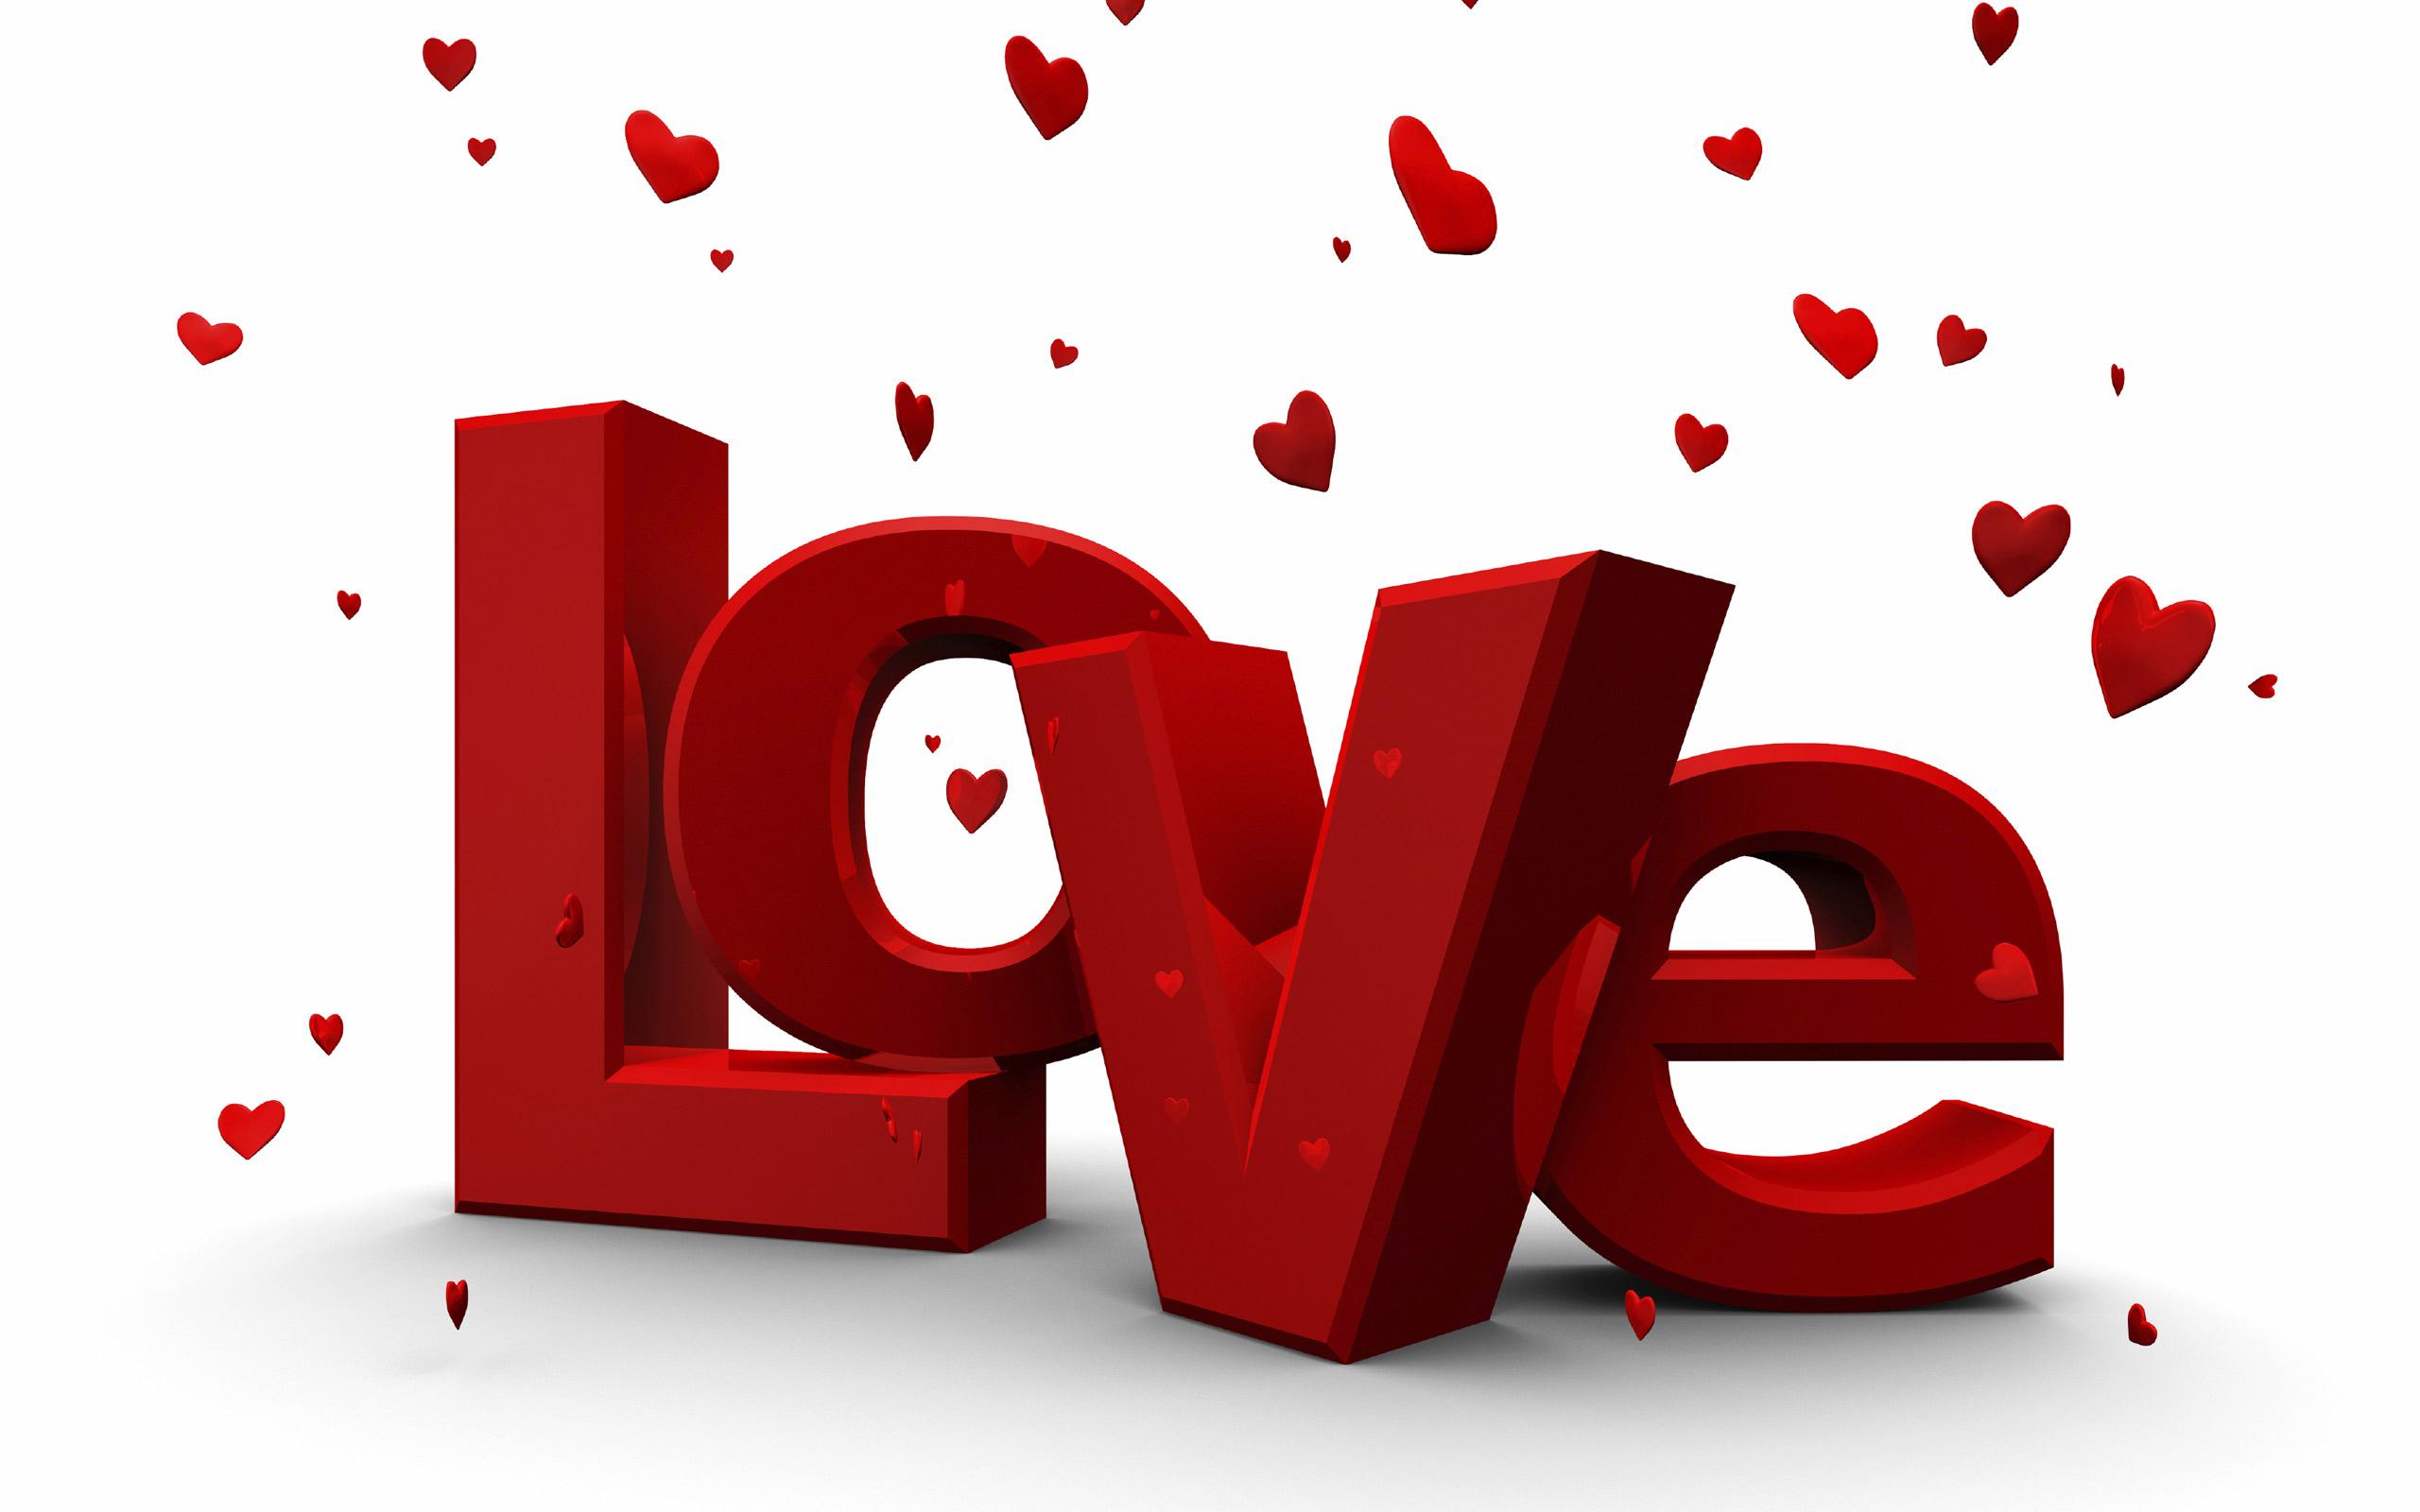 valentines day love wallpaper